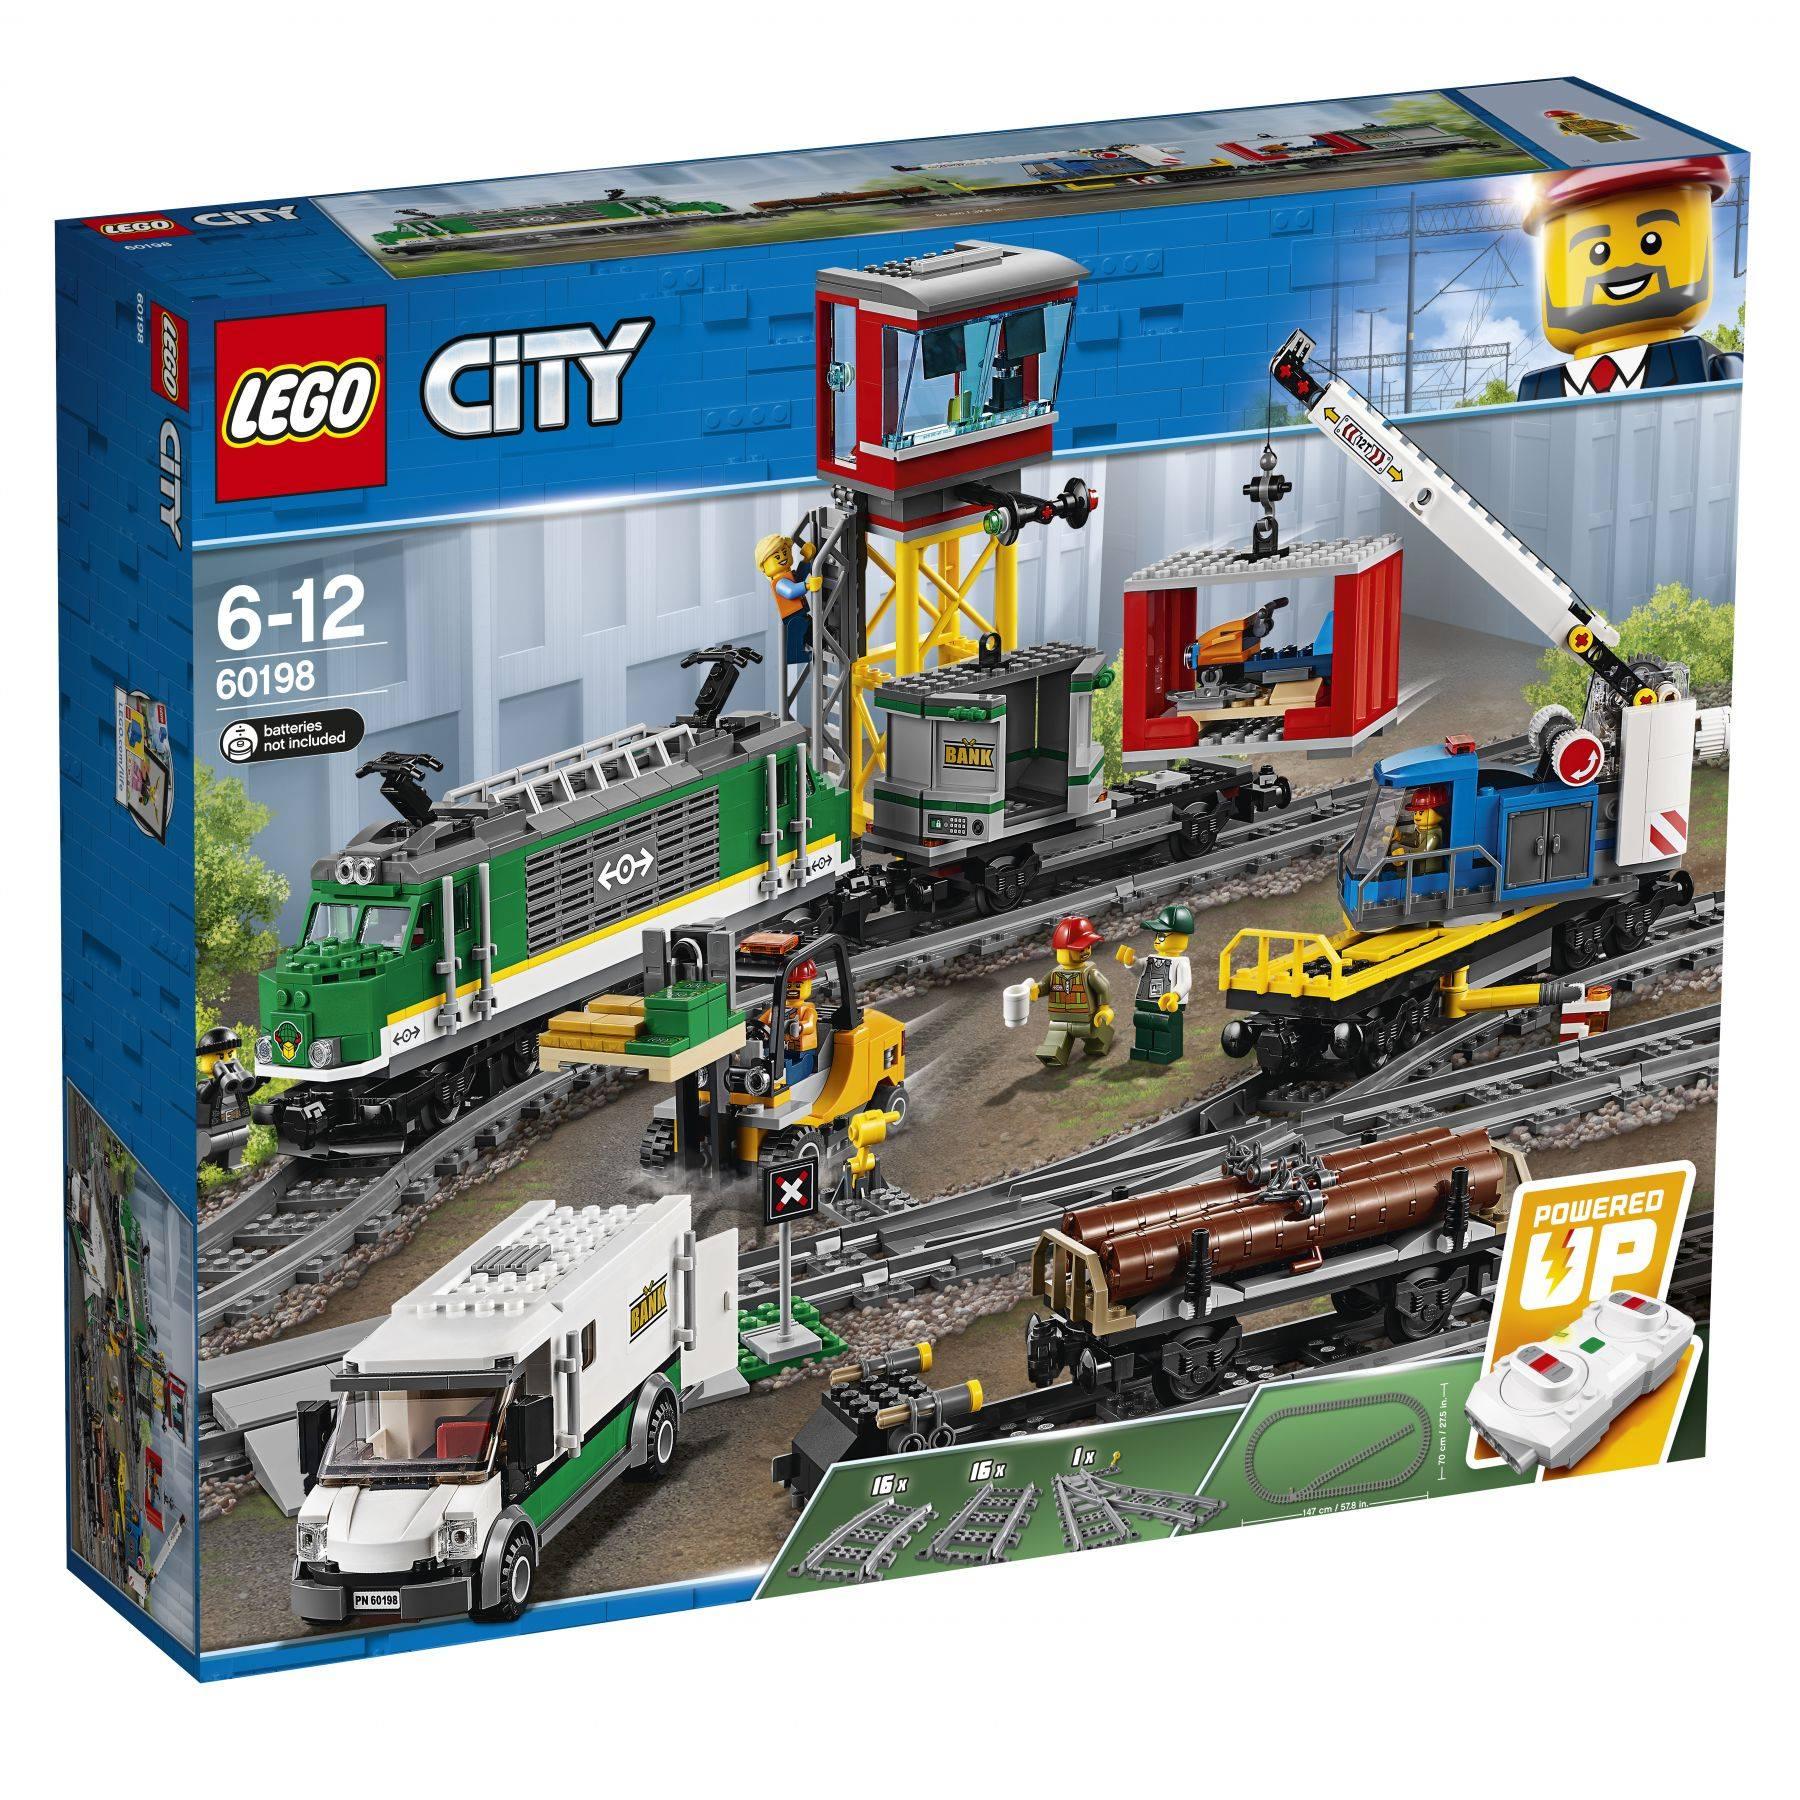 LEGO city cargo train 2018 (set 60198) box front